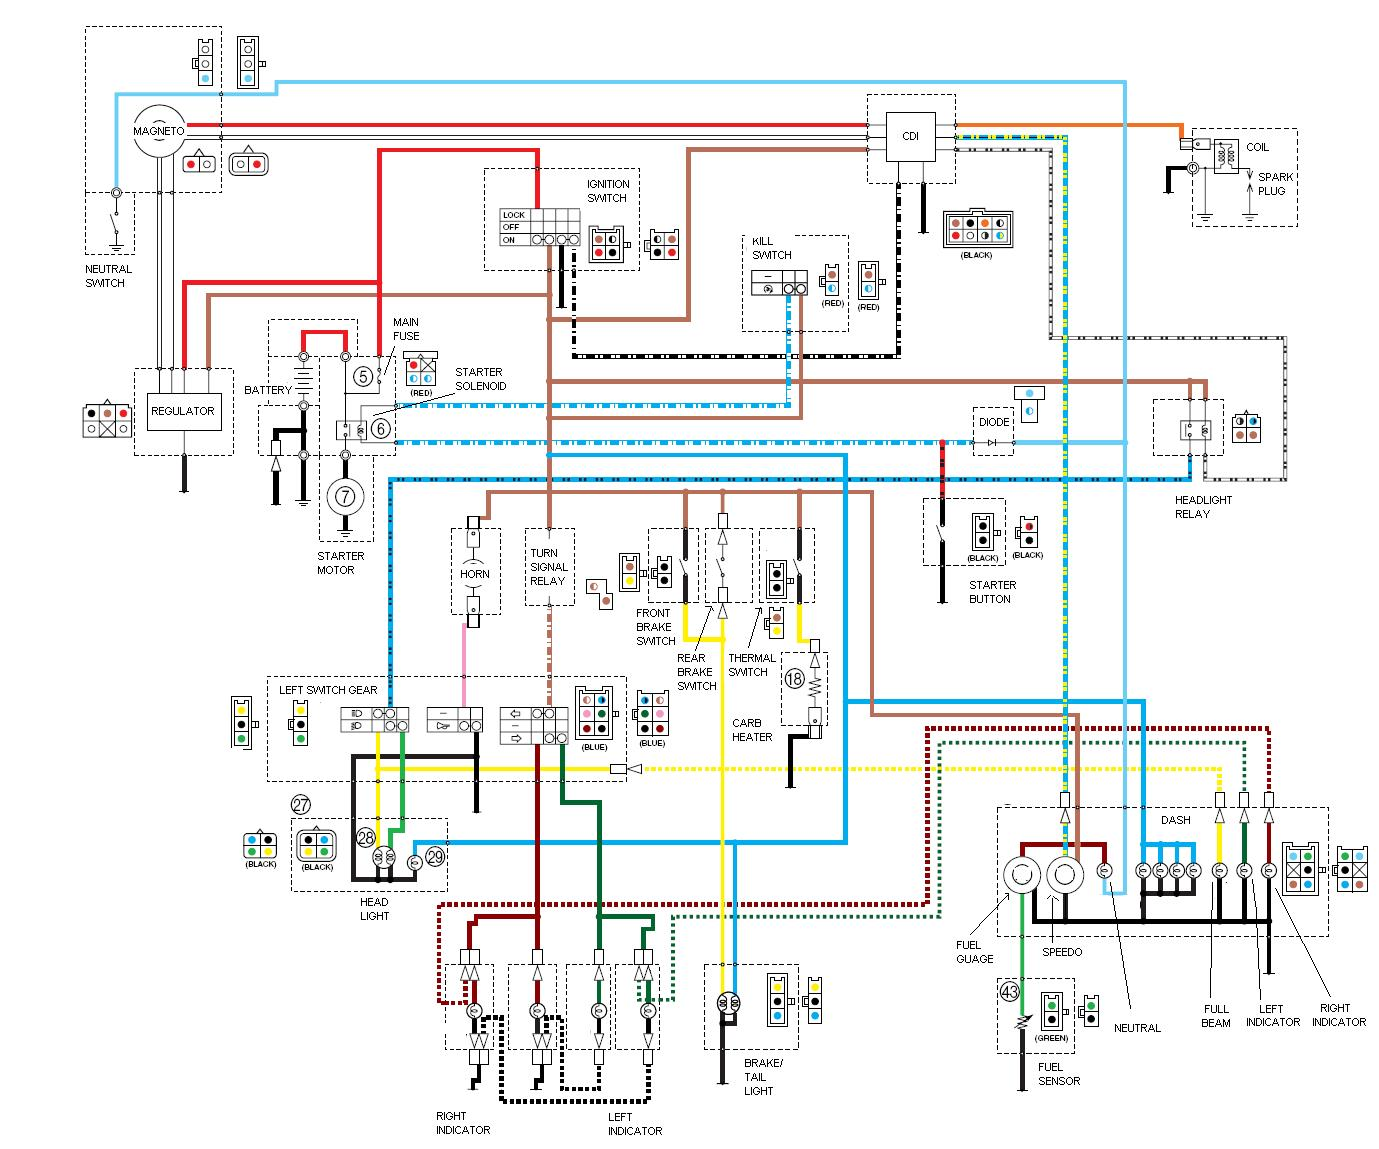 melex gas golf cart wiring diagram trailer connector nz hyundai santa fe parts